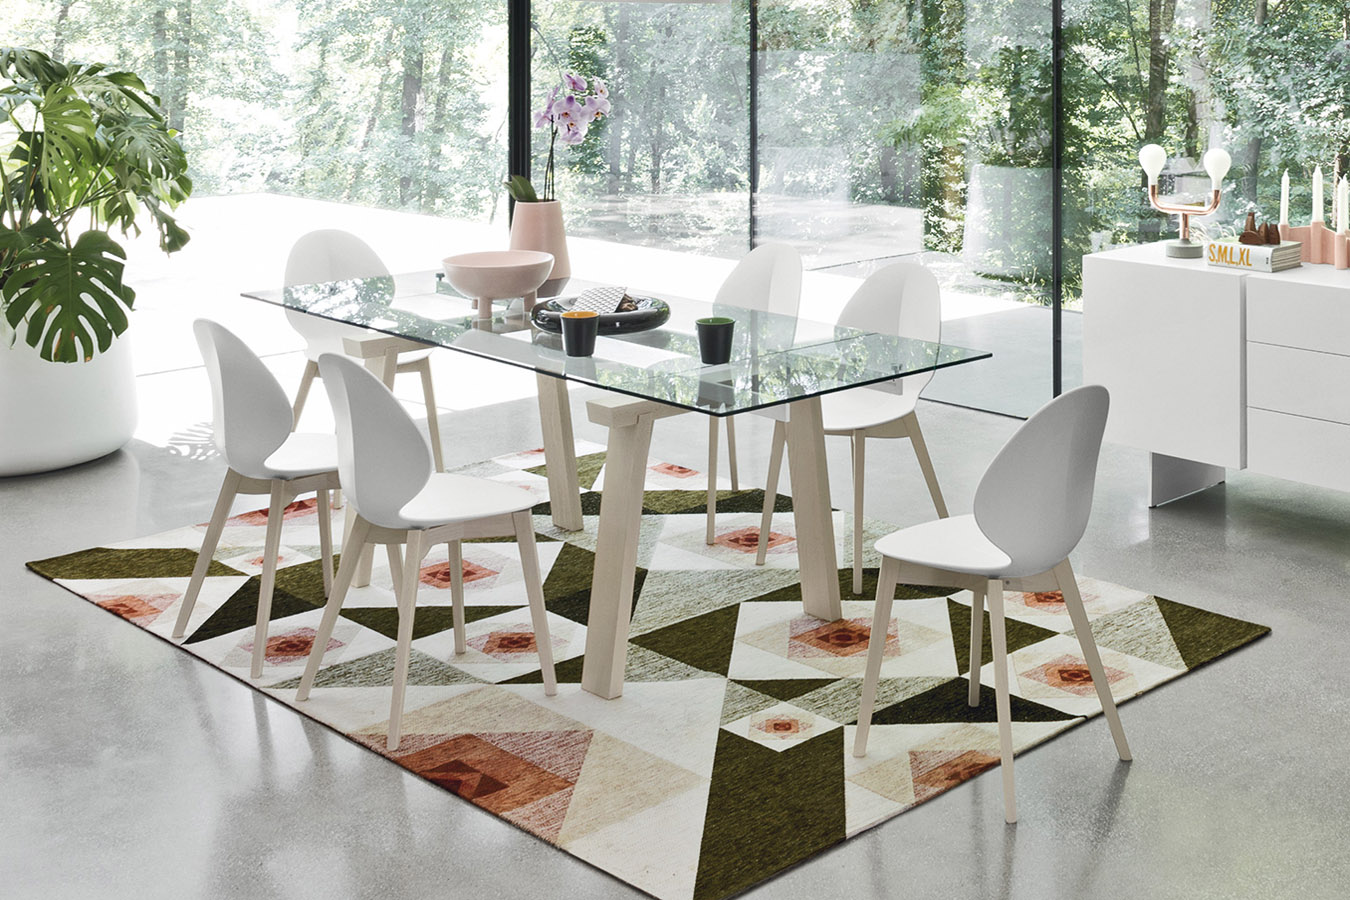 Calligaris-tavolo-allungabile-Levante-moderno-design-pranzo ...